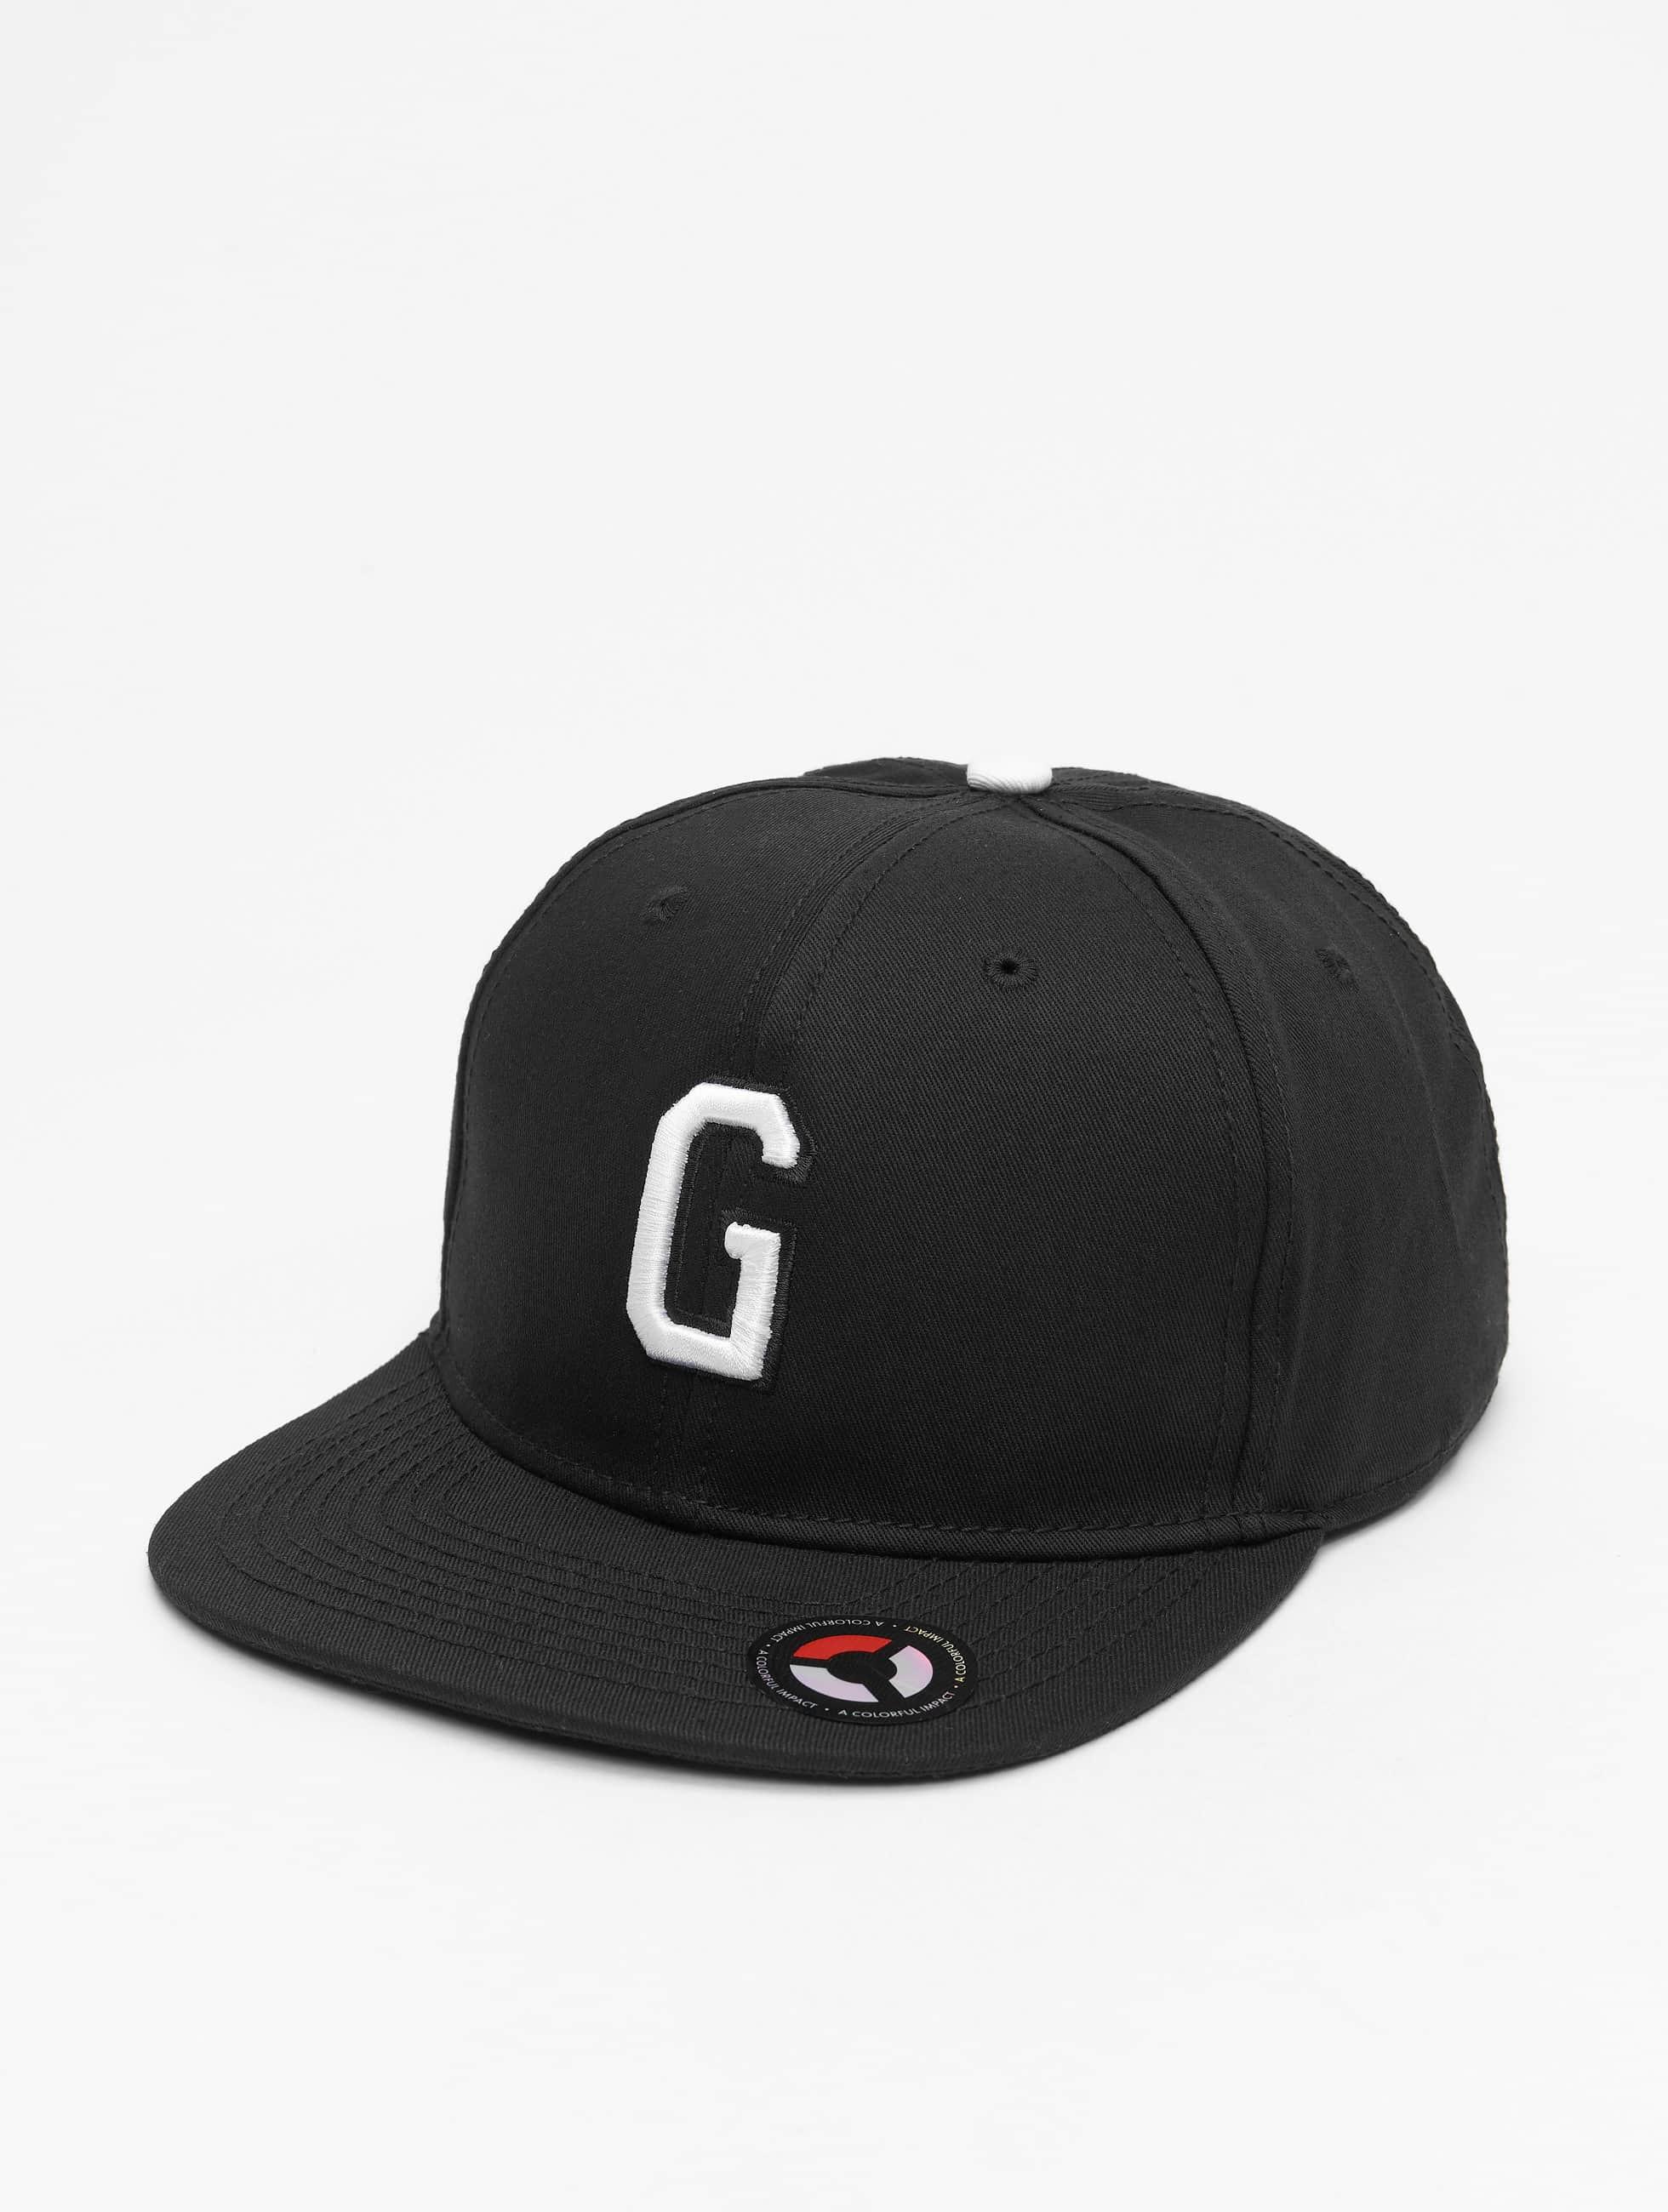 MSTRDS Snapback Caps G Letter musta